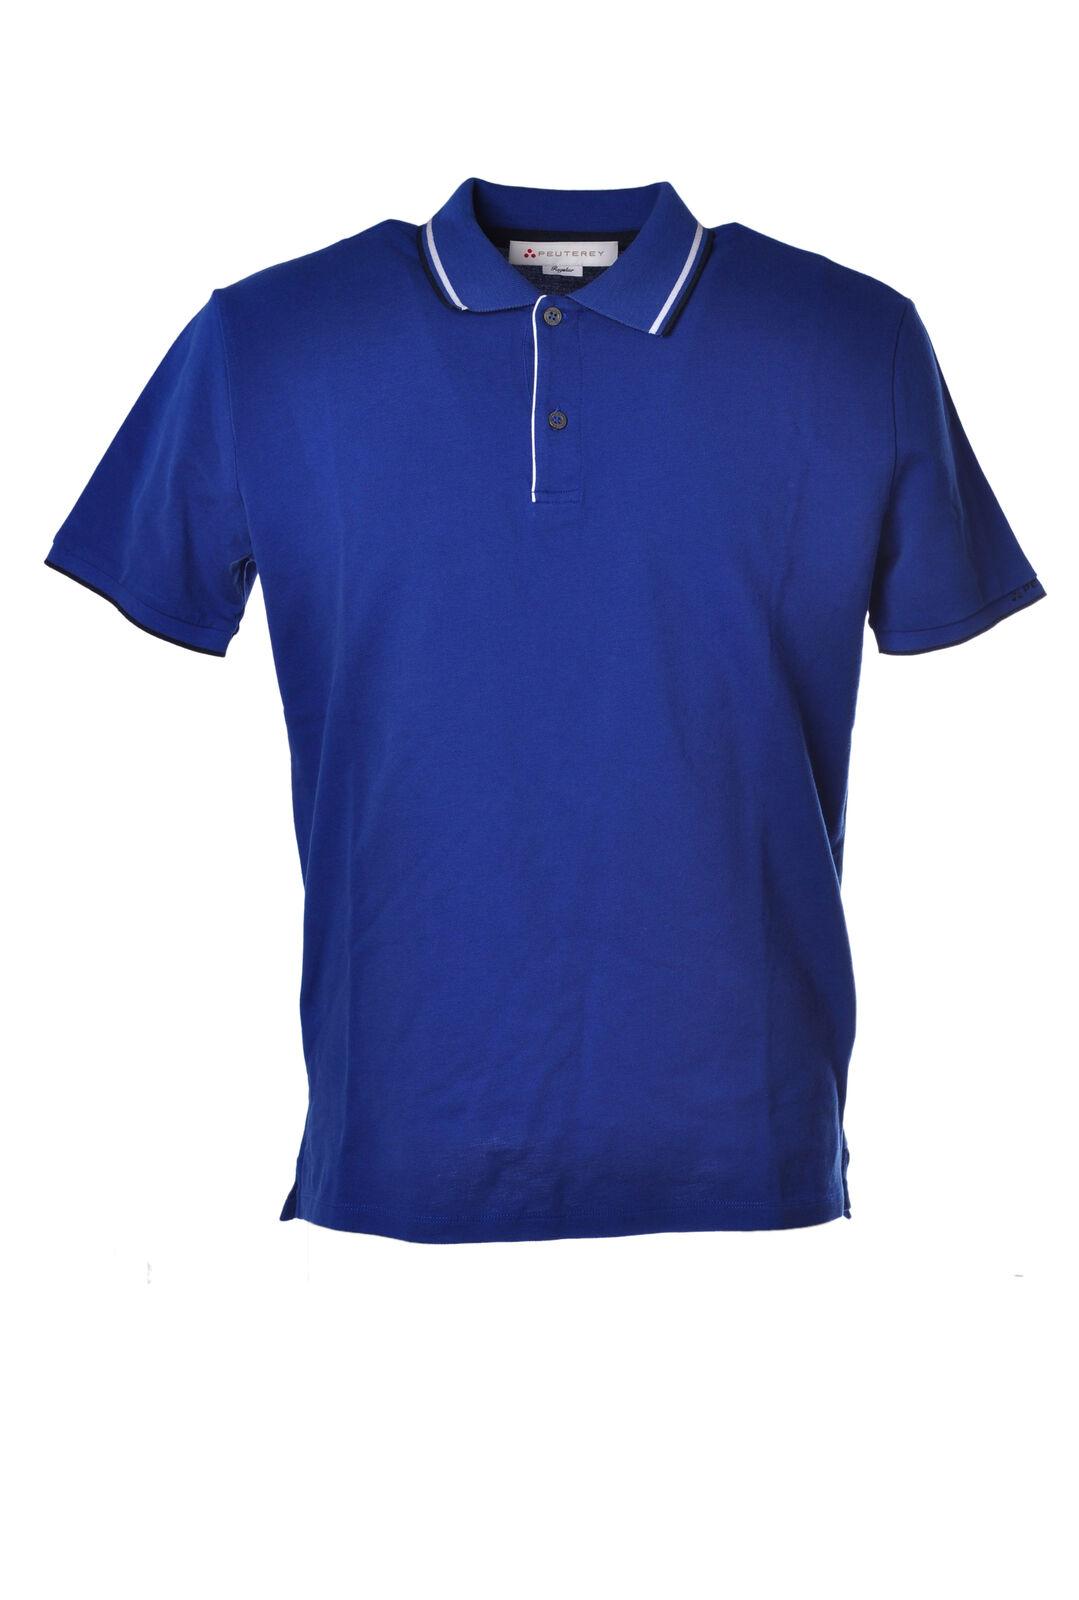 Peuterey  -  Polo - Male - Blau - 1839018A182243